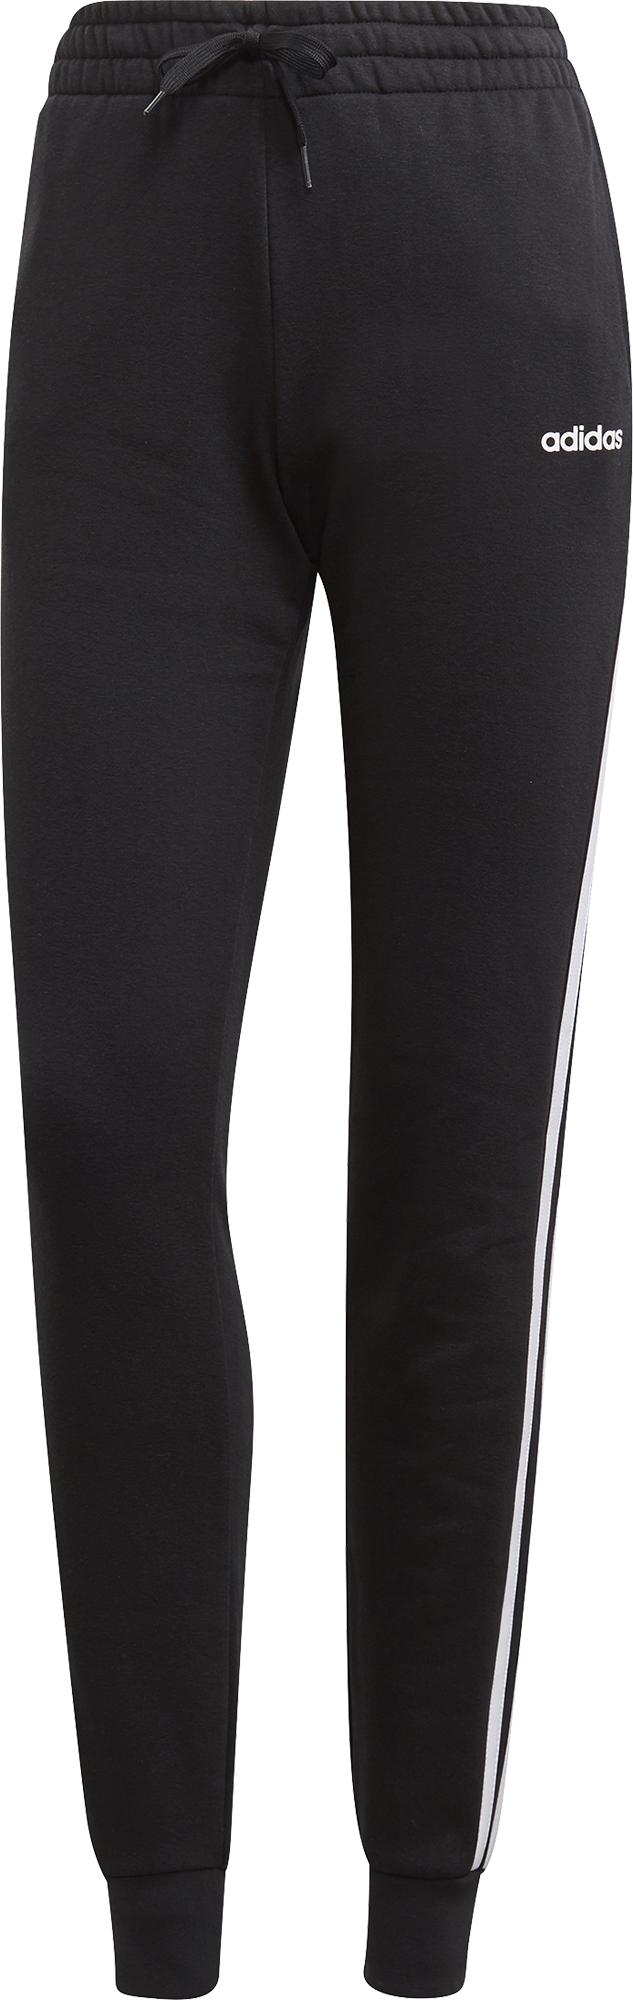 Adidas Брюки женские Adidas Essentials 3-Stripes, размер XL все цены